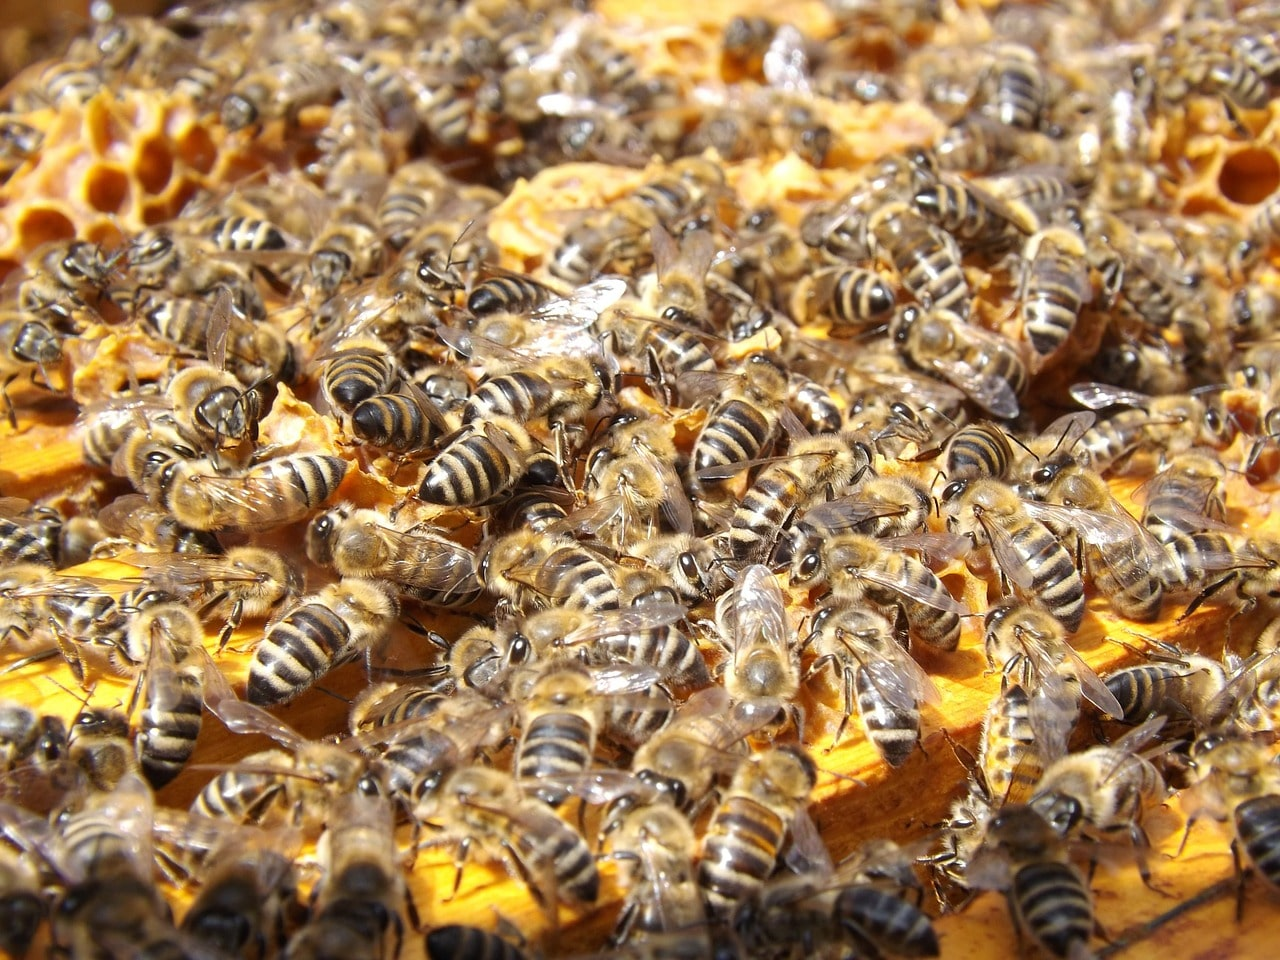 apicoltura per allevare api